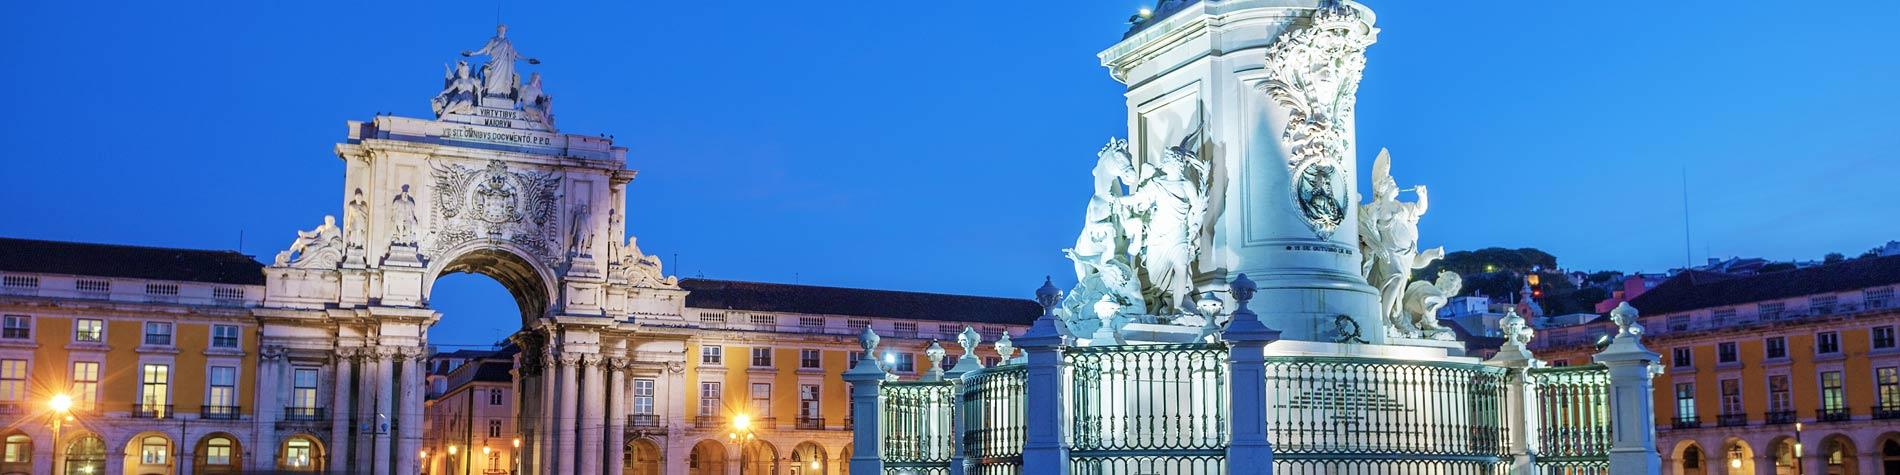 Billigflüge Nach Lissabon Lis Ab 1798 Ryanaircom